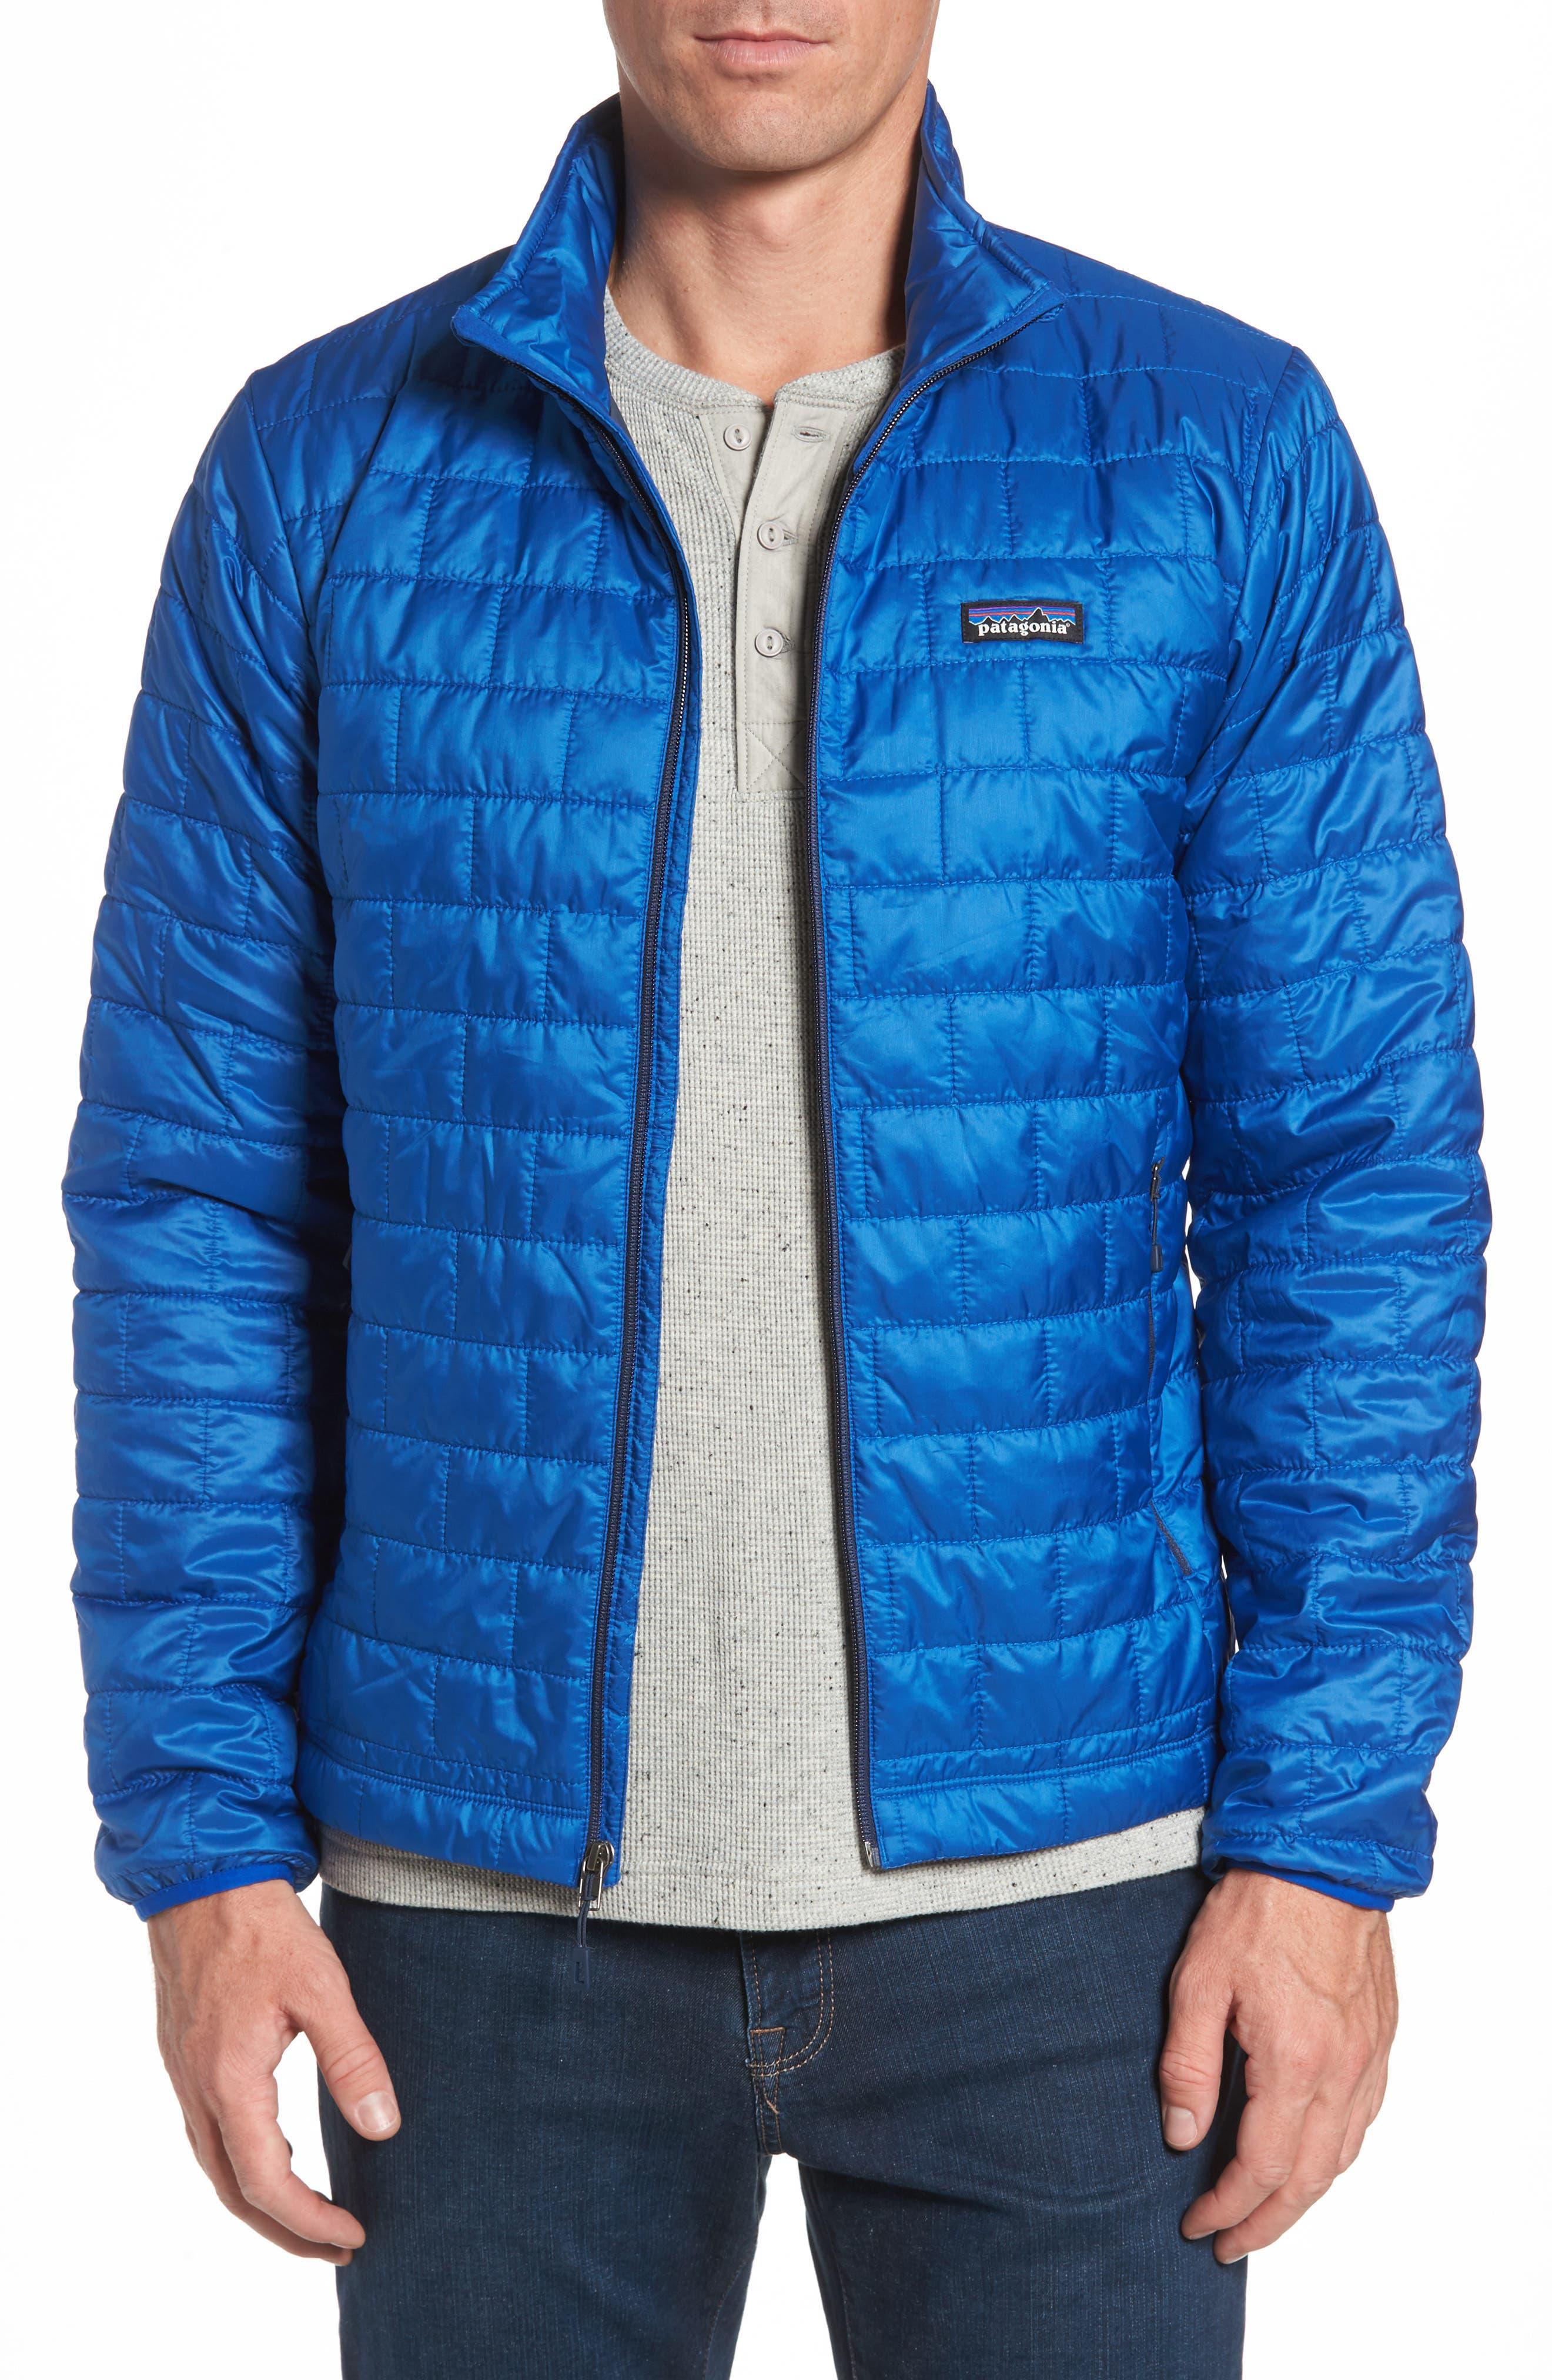 Patagonia 'Nano Puff®' Water Resistant Jacket